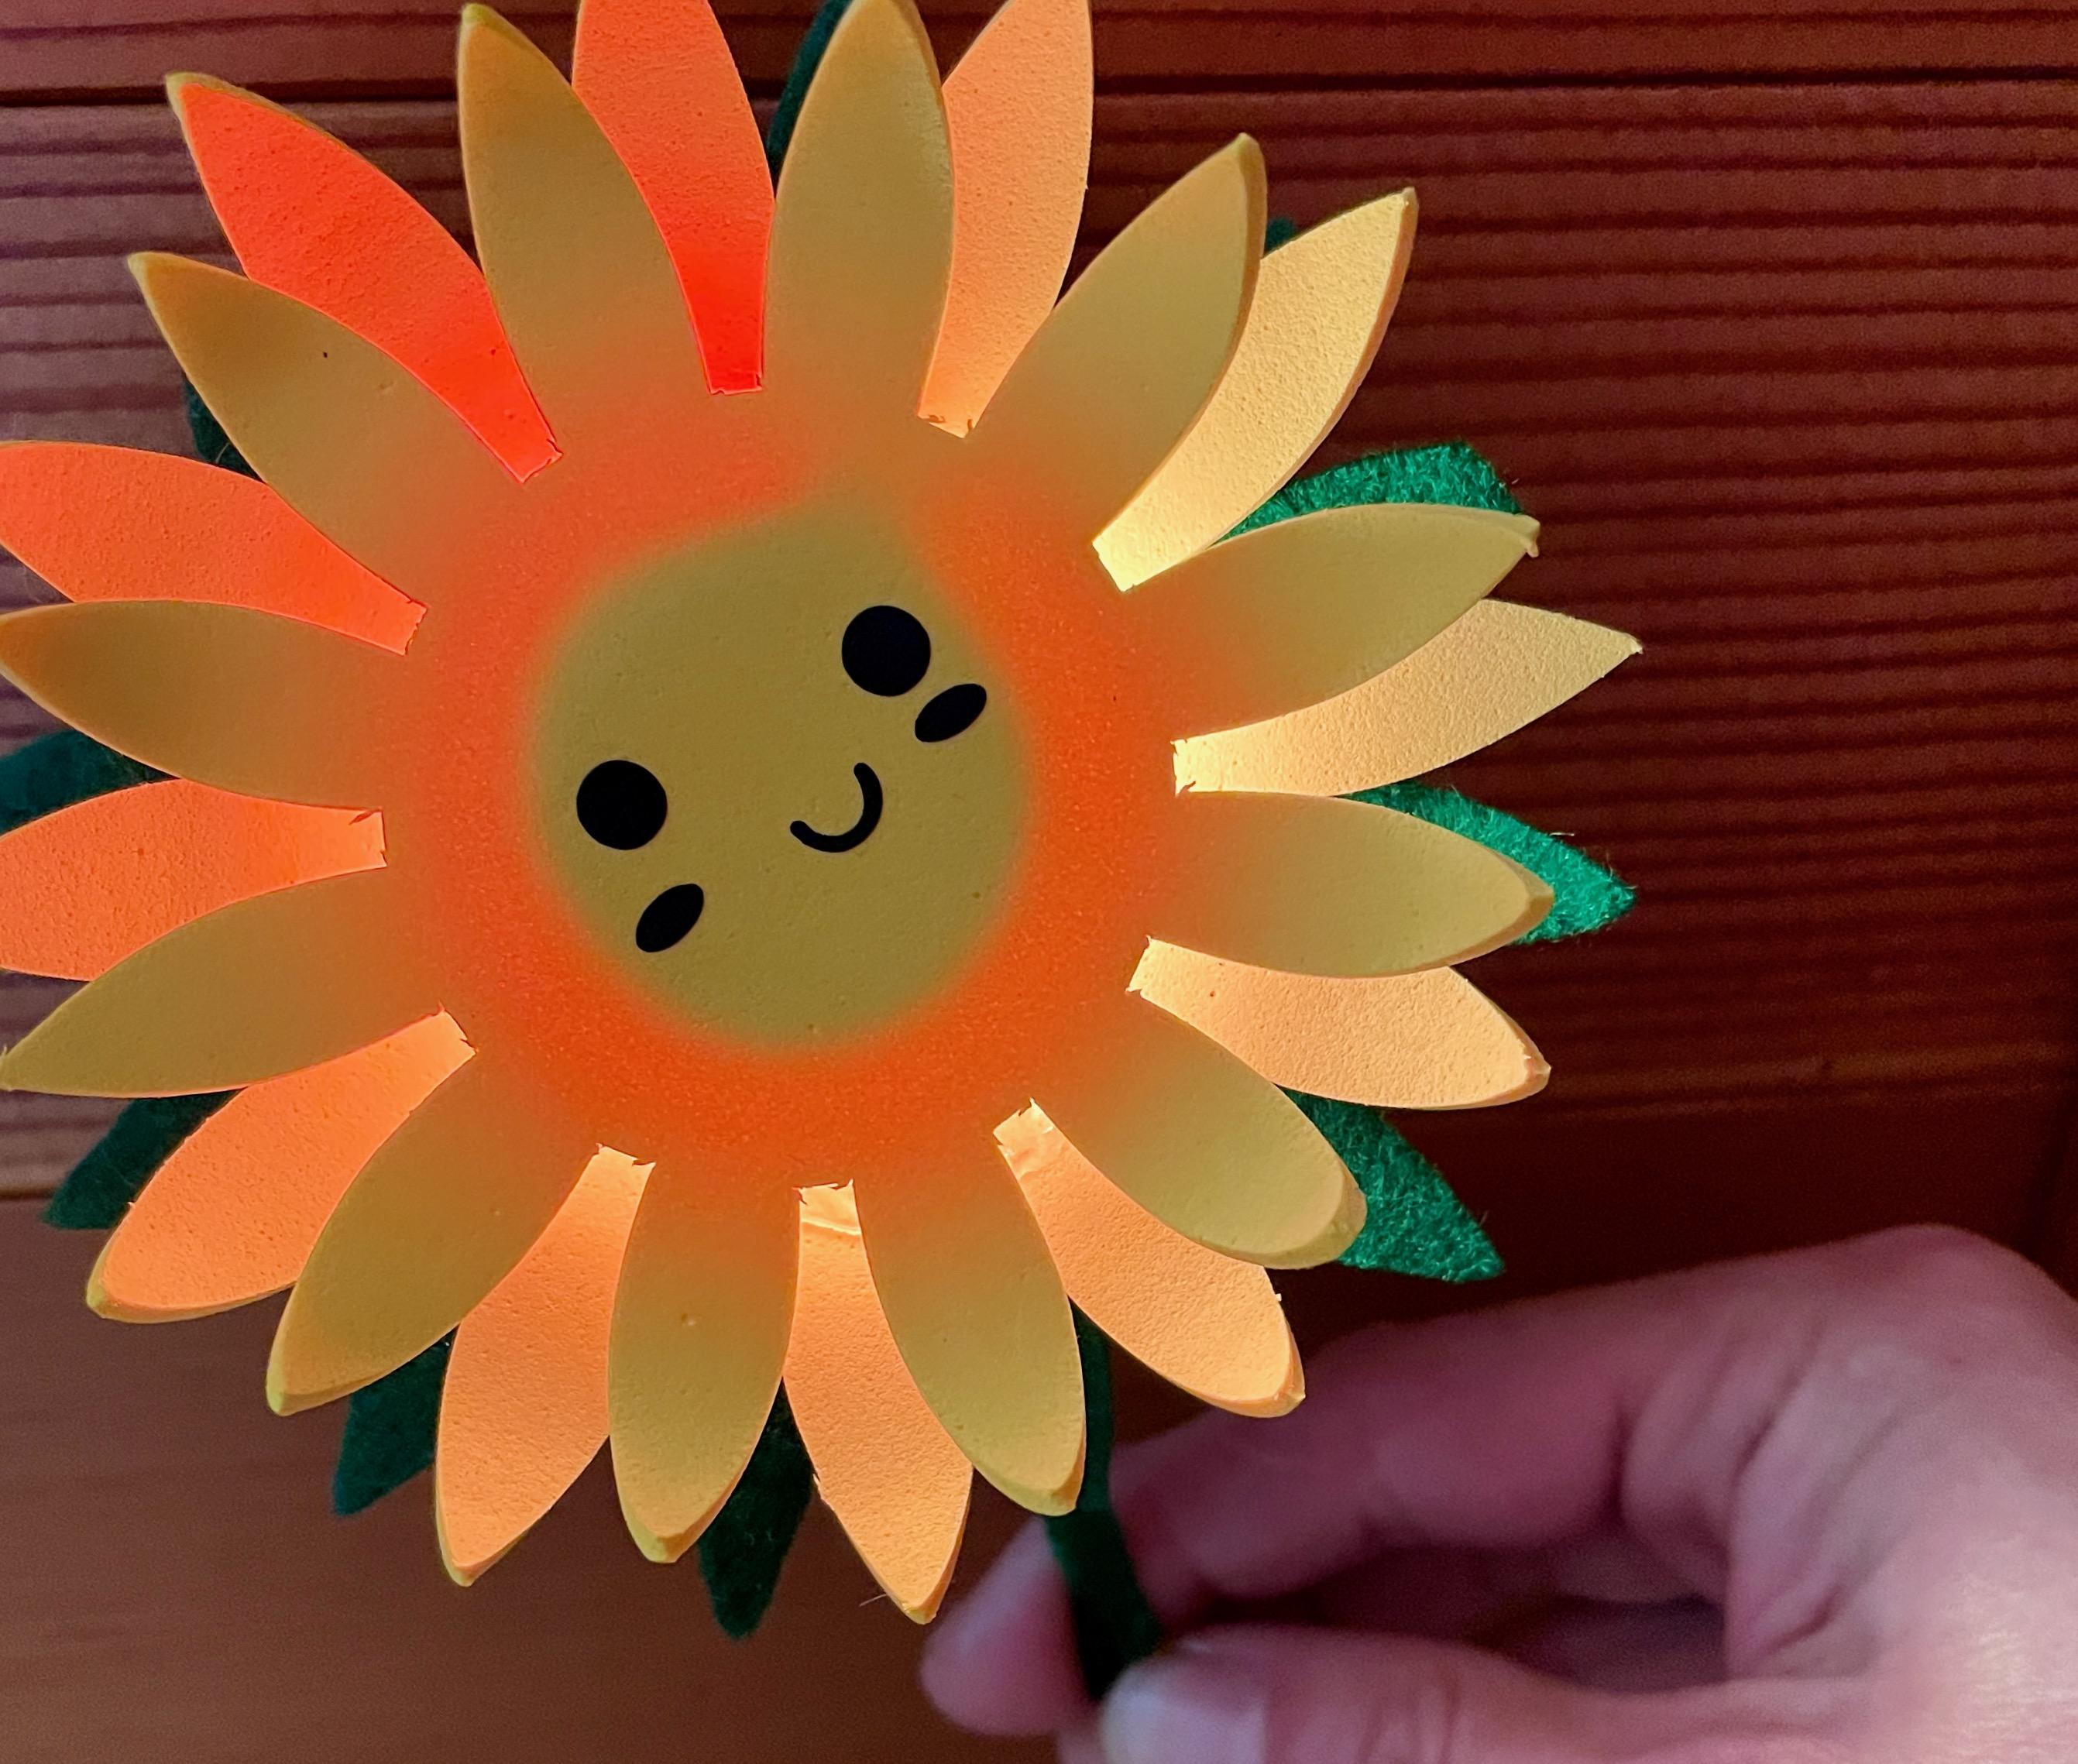 led_strips_15_happyflower.jpeg